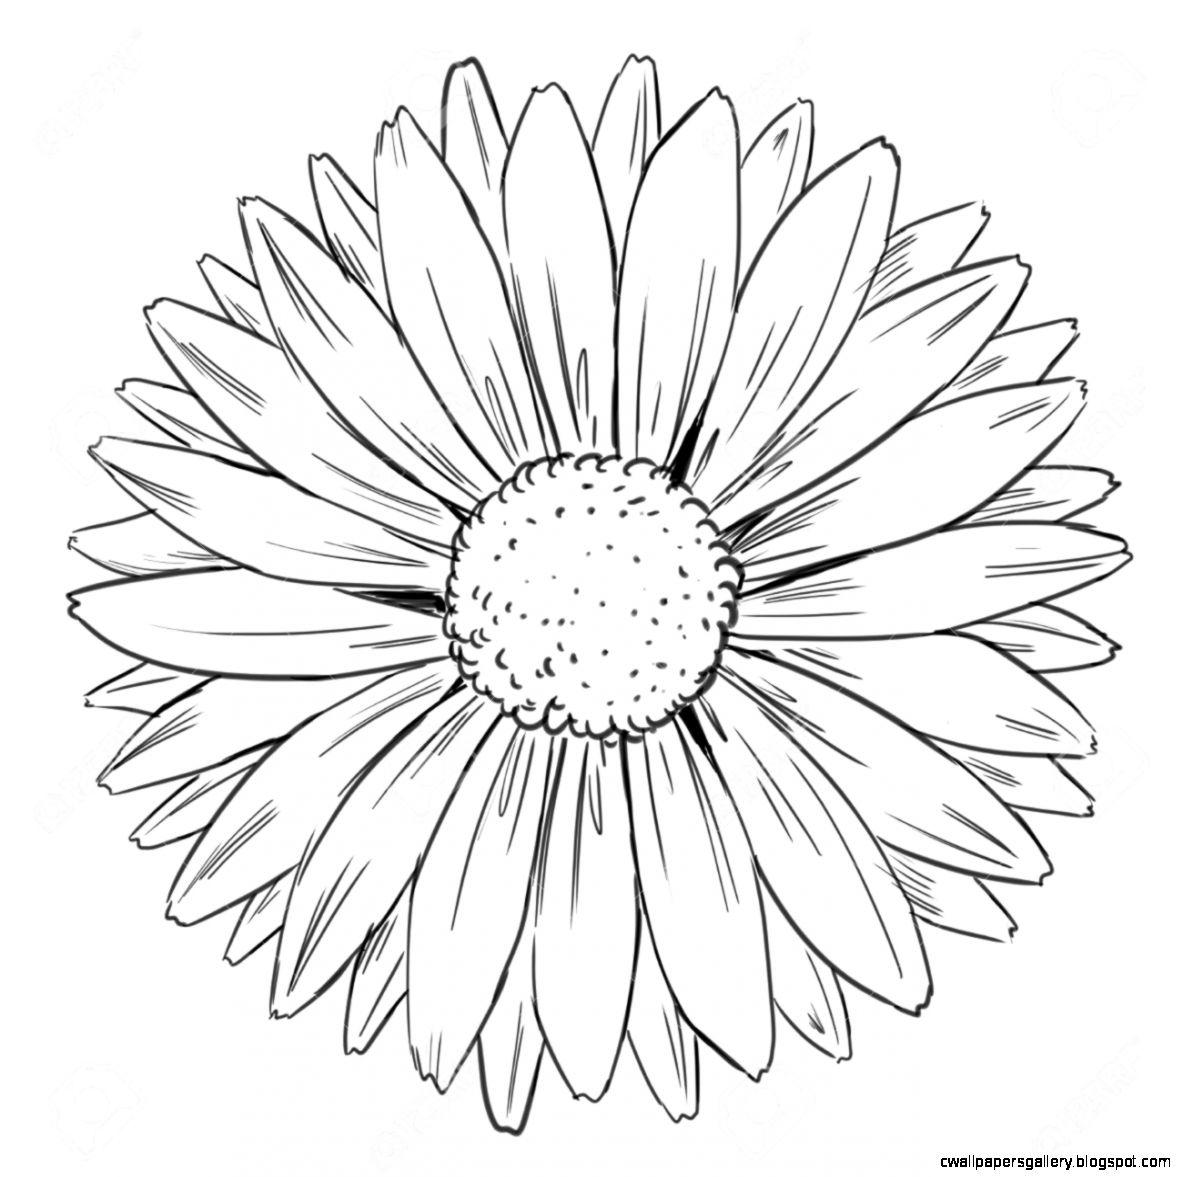 Illustration Of Petal Arrangement Of A Flower Royalty Free